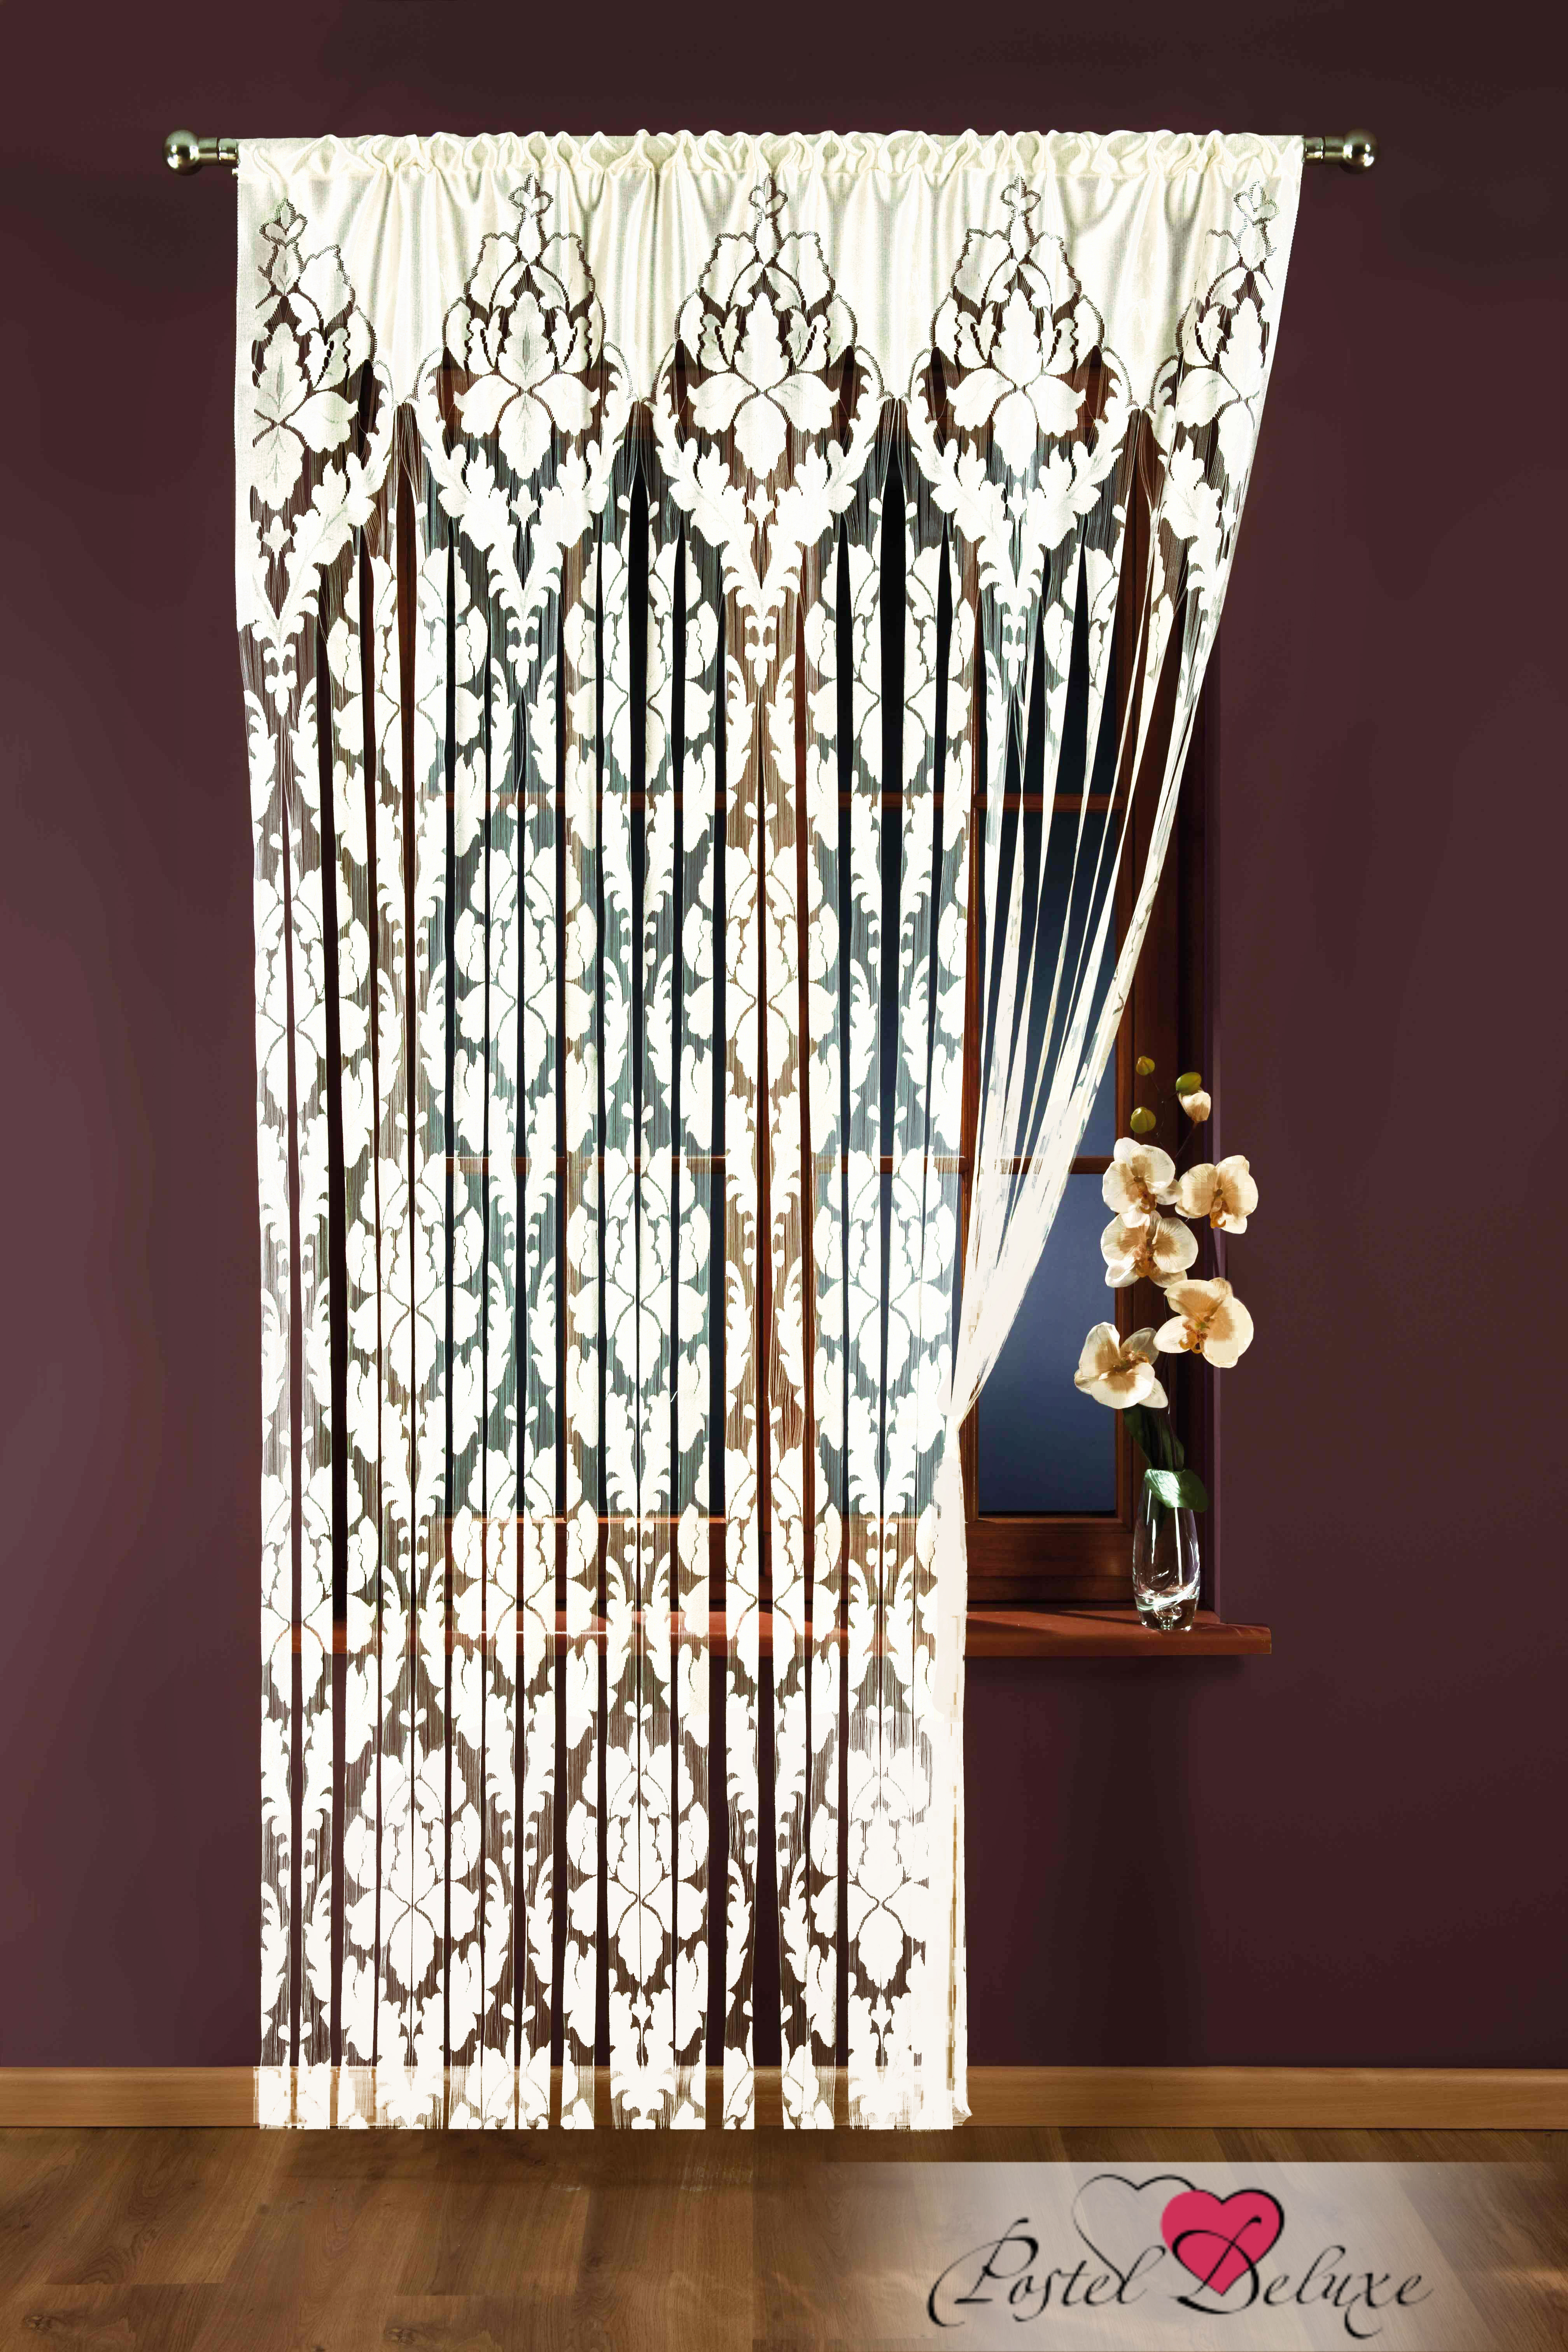 Шторы Wisan Нитяные шторы Цвет: Белый wisan wisan нитяные шторы joelle цвет кремовый бежевый